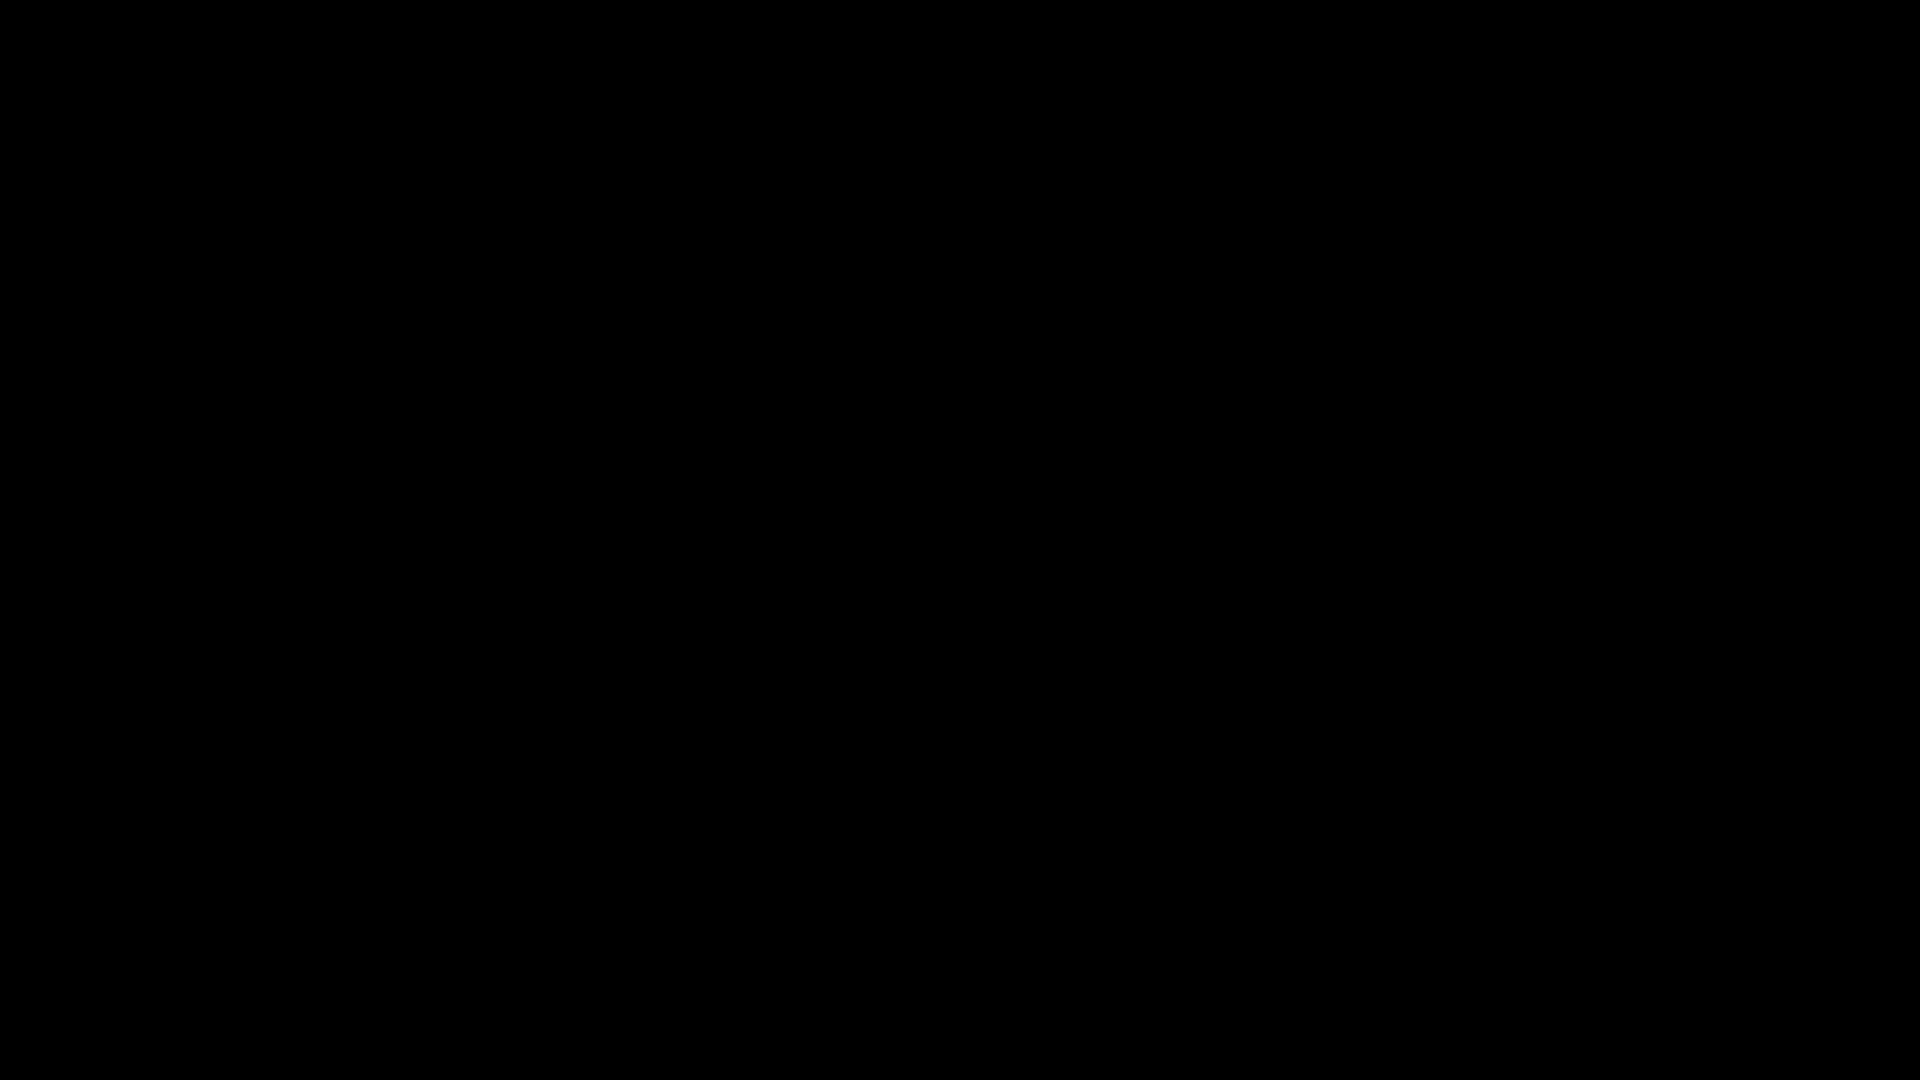 dwc-hydro-grow-ep-3-vegetation-cycle-thumbnail